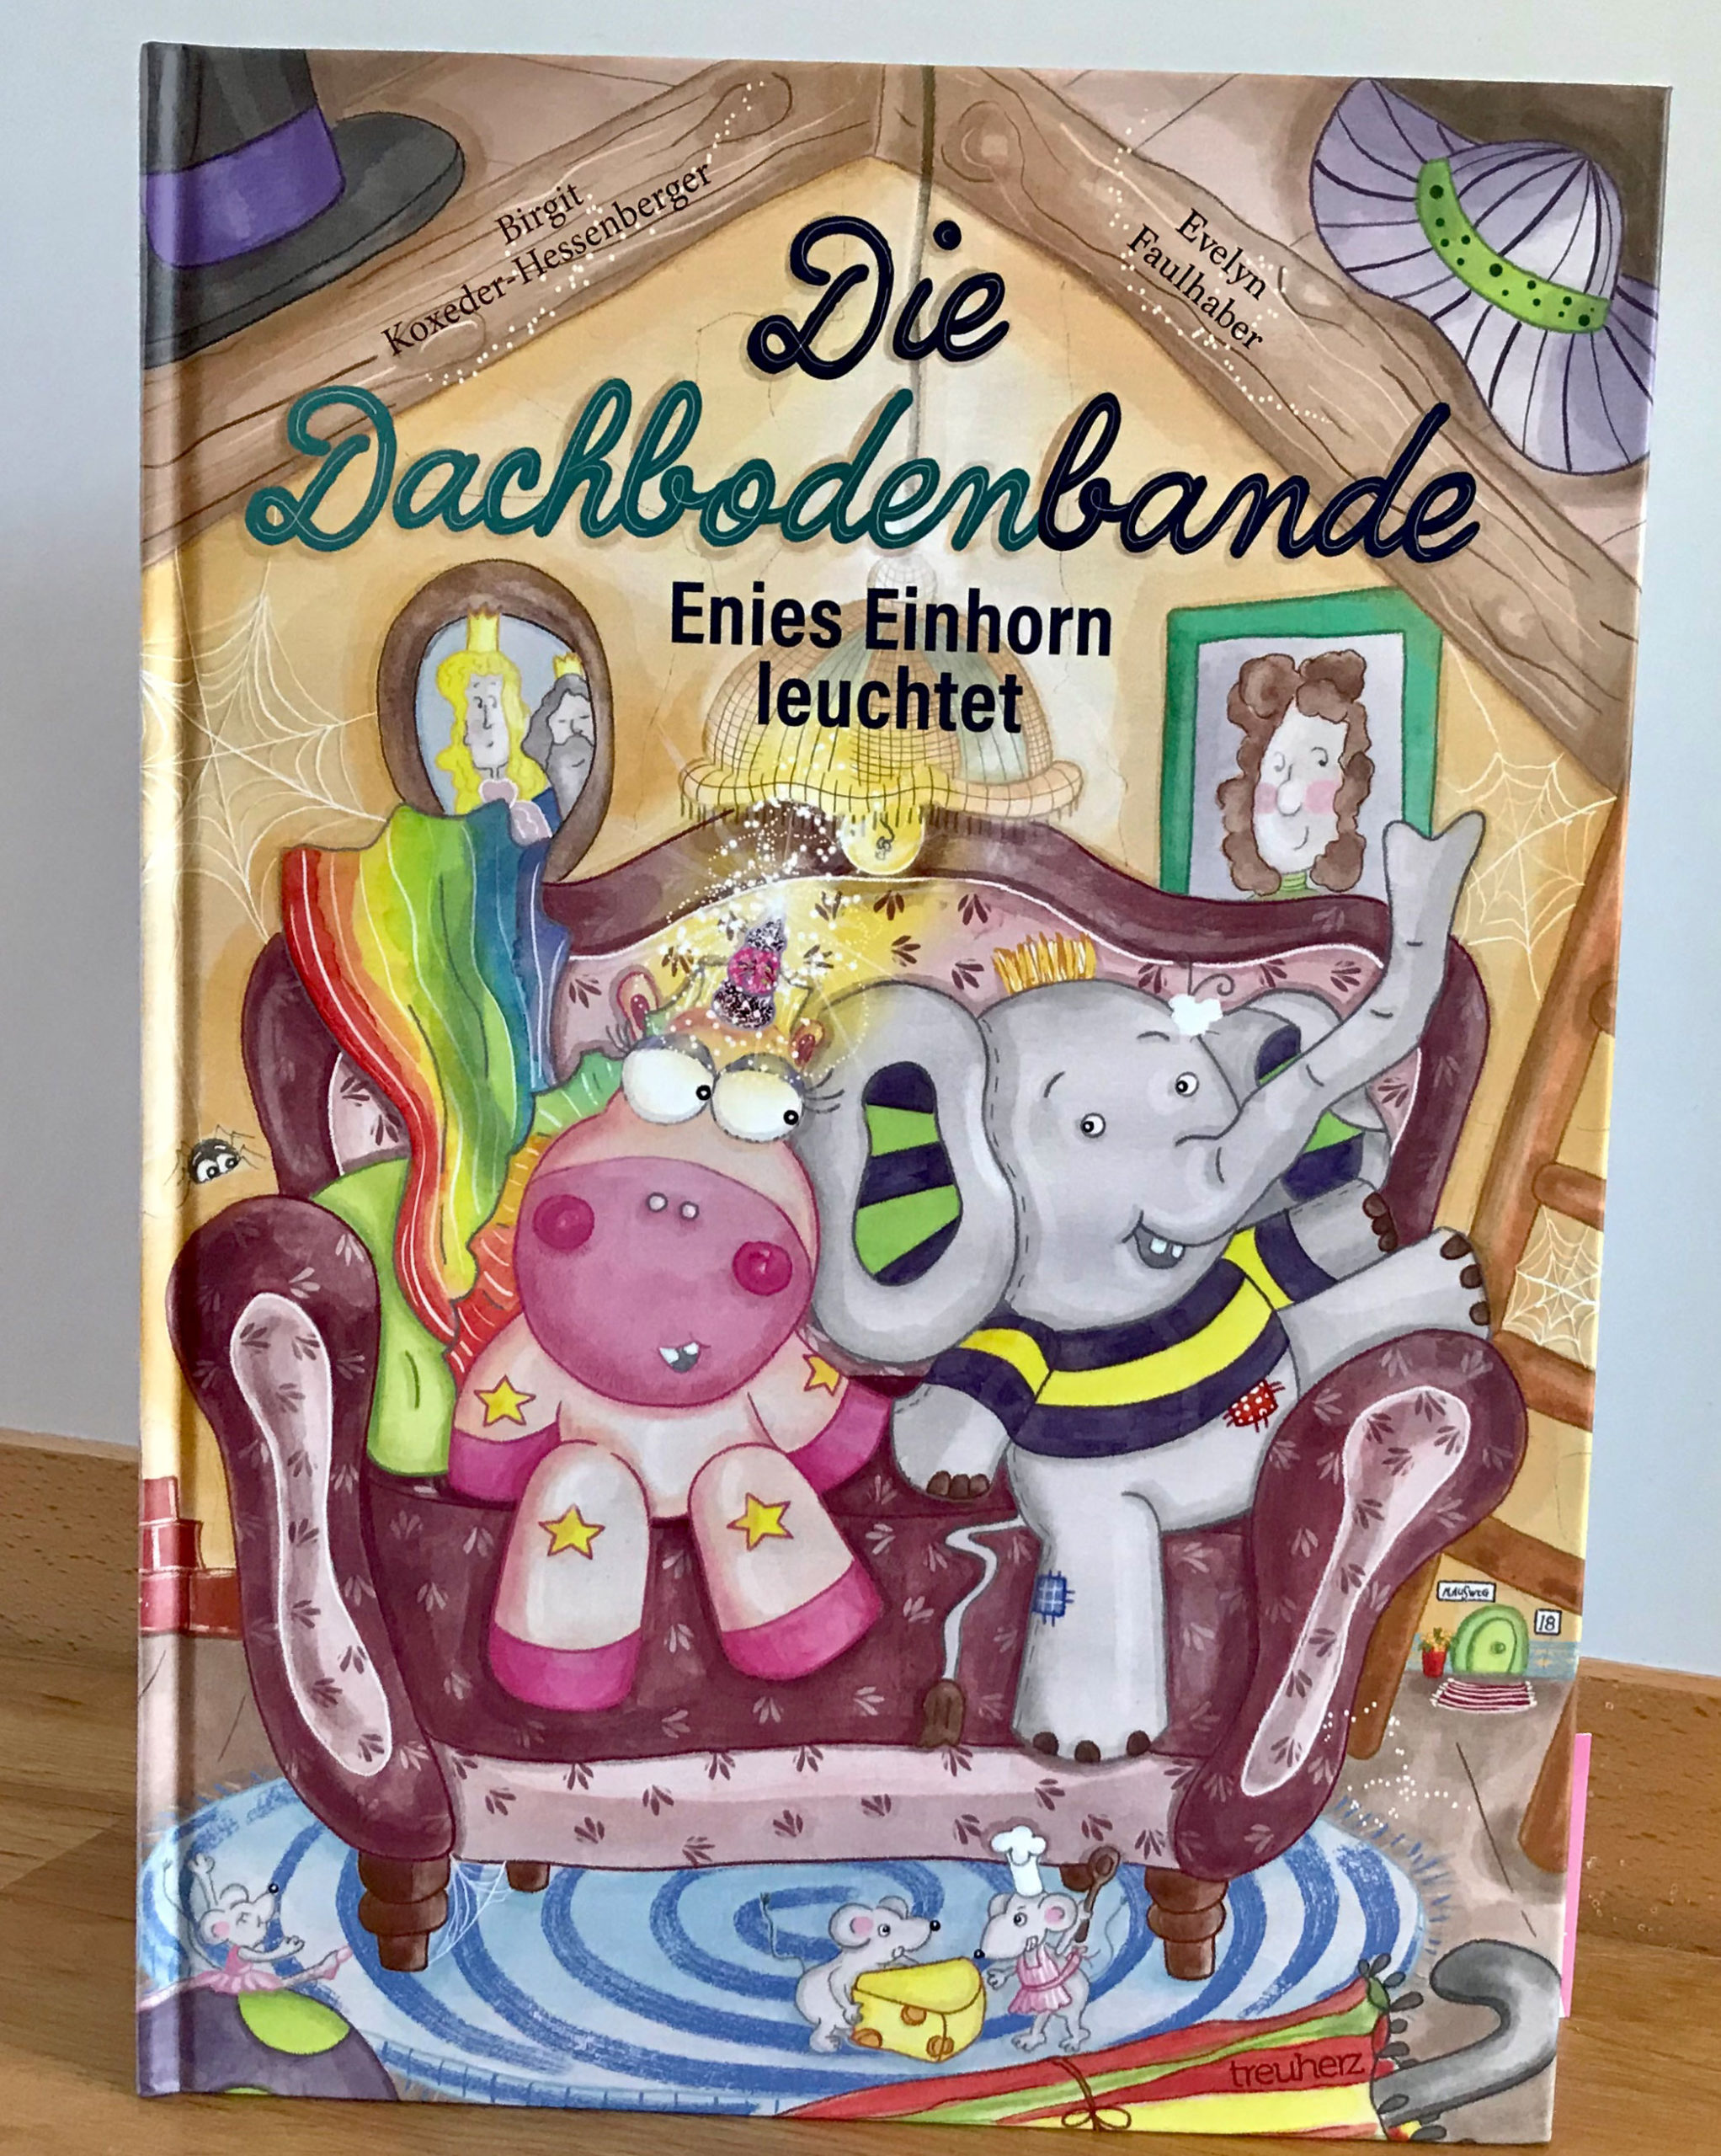 kinderbuch, einhorn, elefant, die dachbodenbande-enies einhorn leuchtet, treuherz verlag, evelyn faulhaber illustration, birgit koxeder-hessenberger